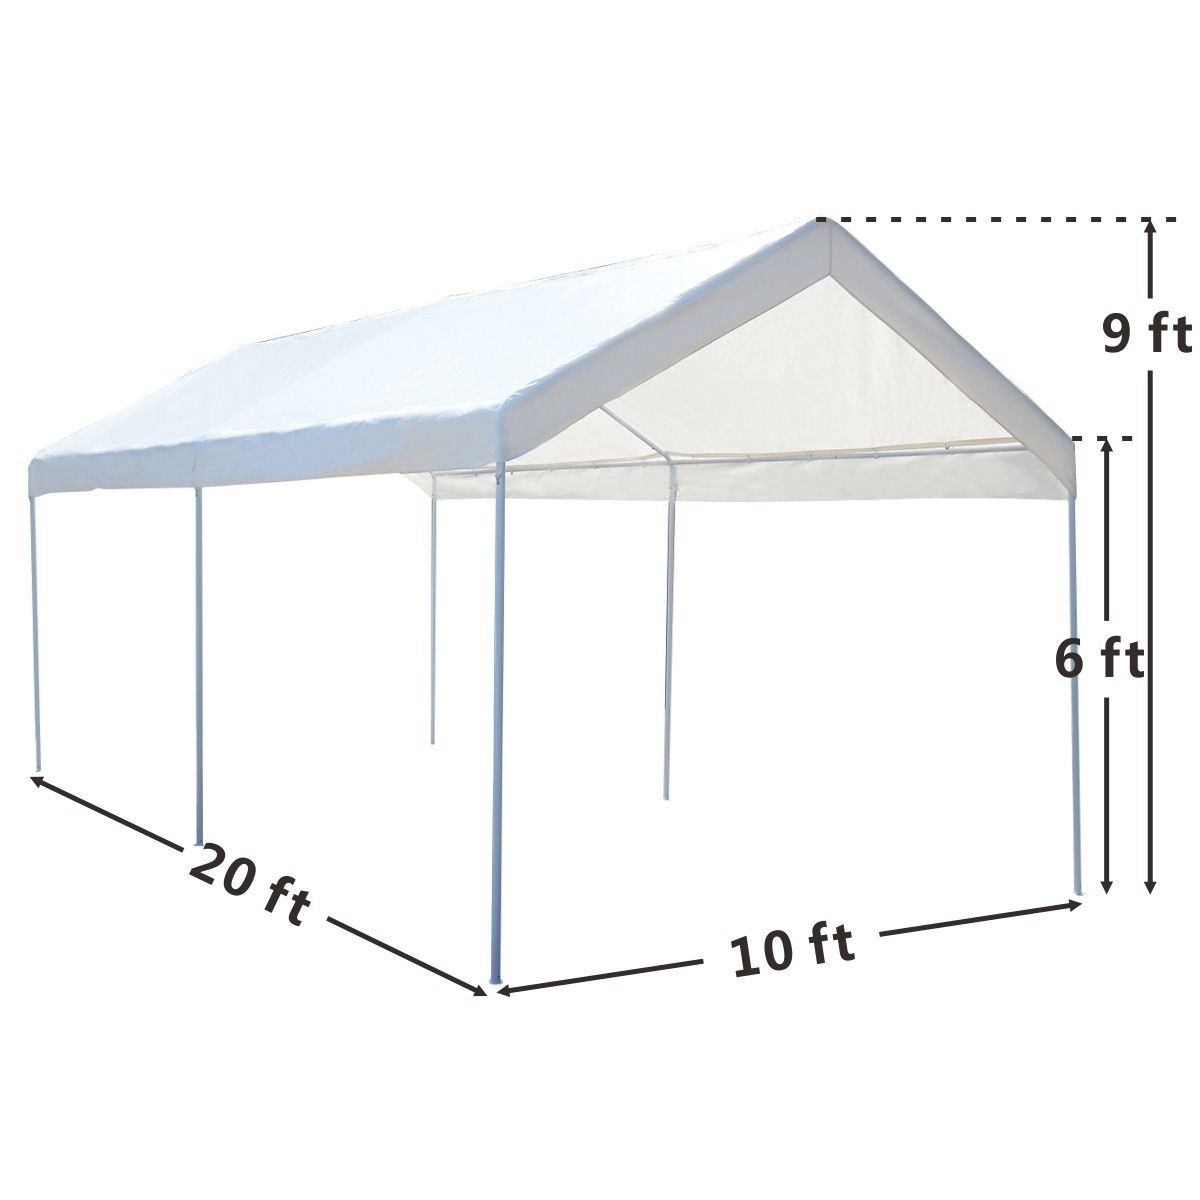 Portable car carport garage cover steel frame canopy for Steel frame tents